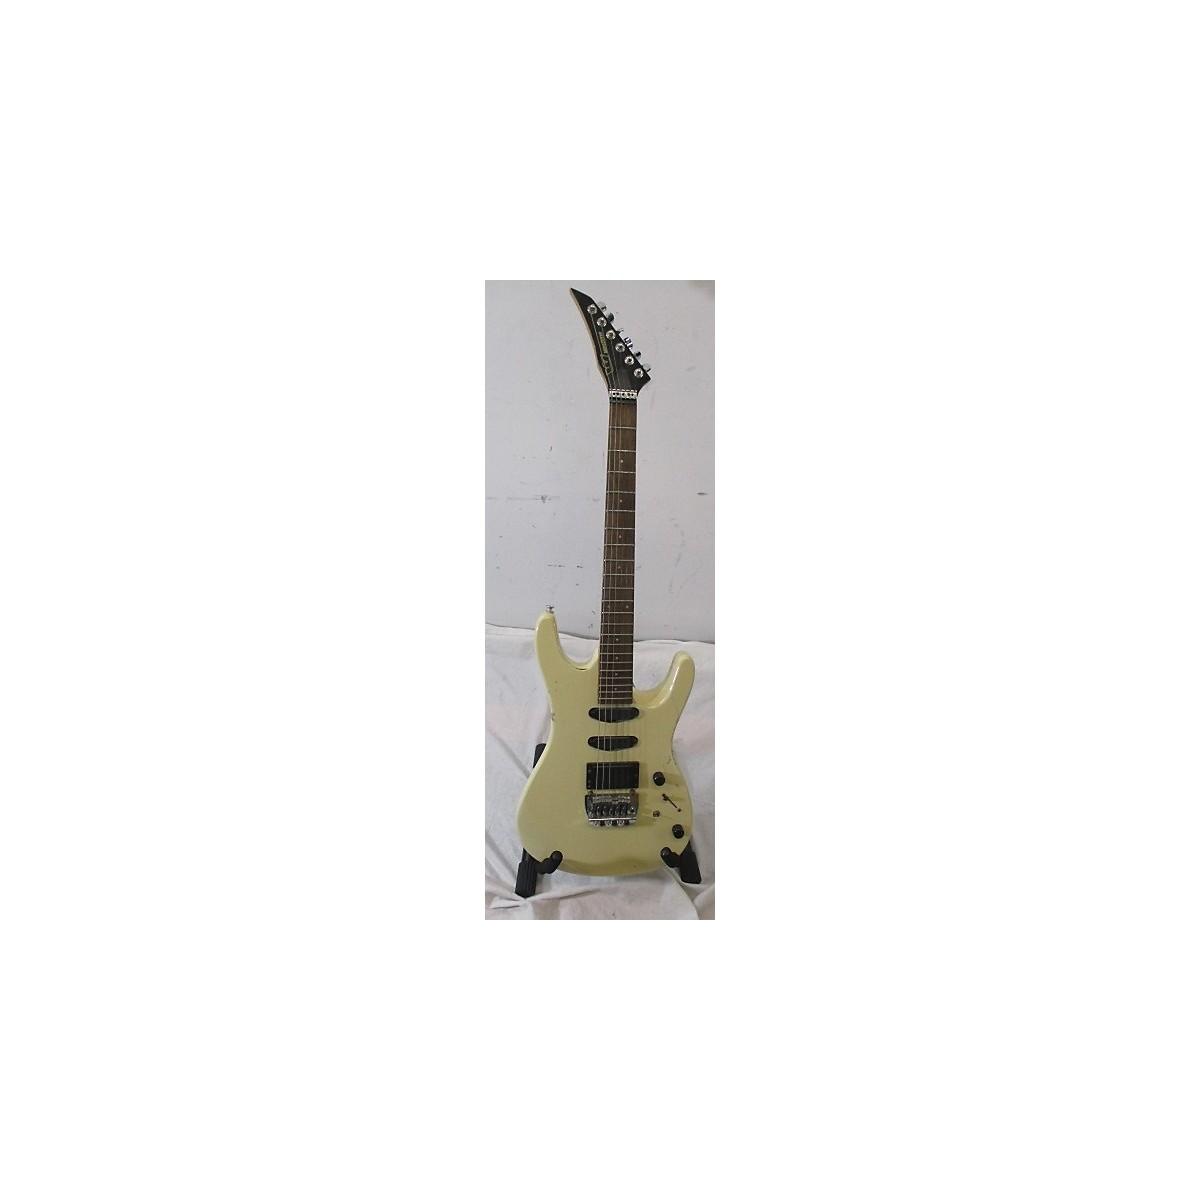 WESTONE 1980s Guitar Solid Body Electric Guitar